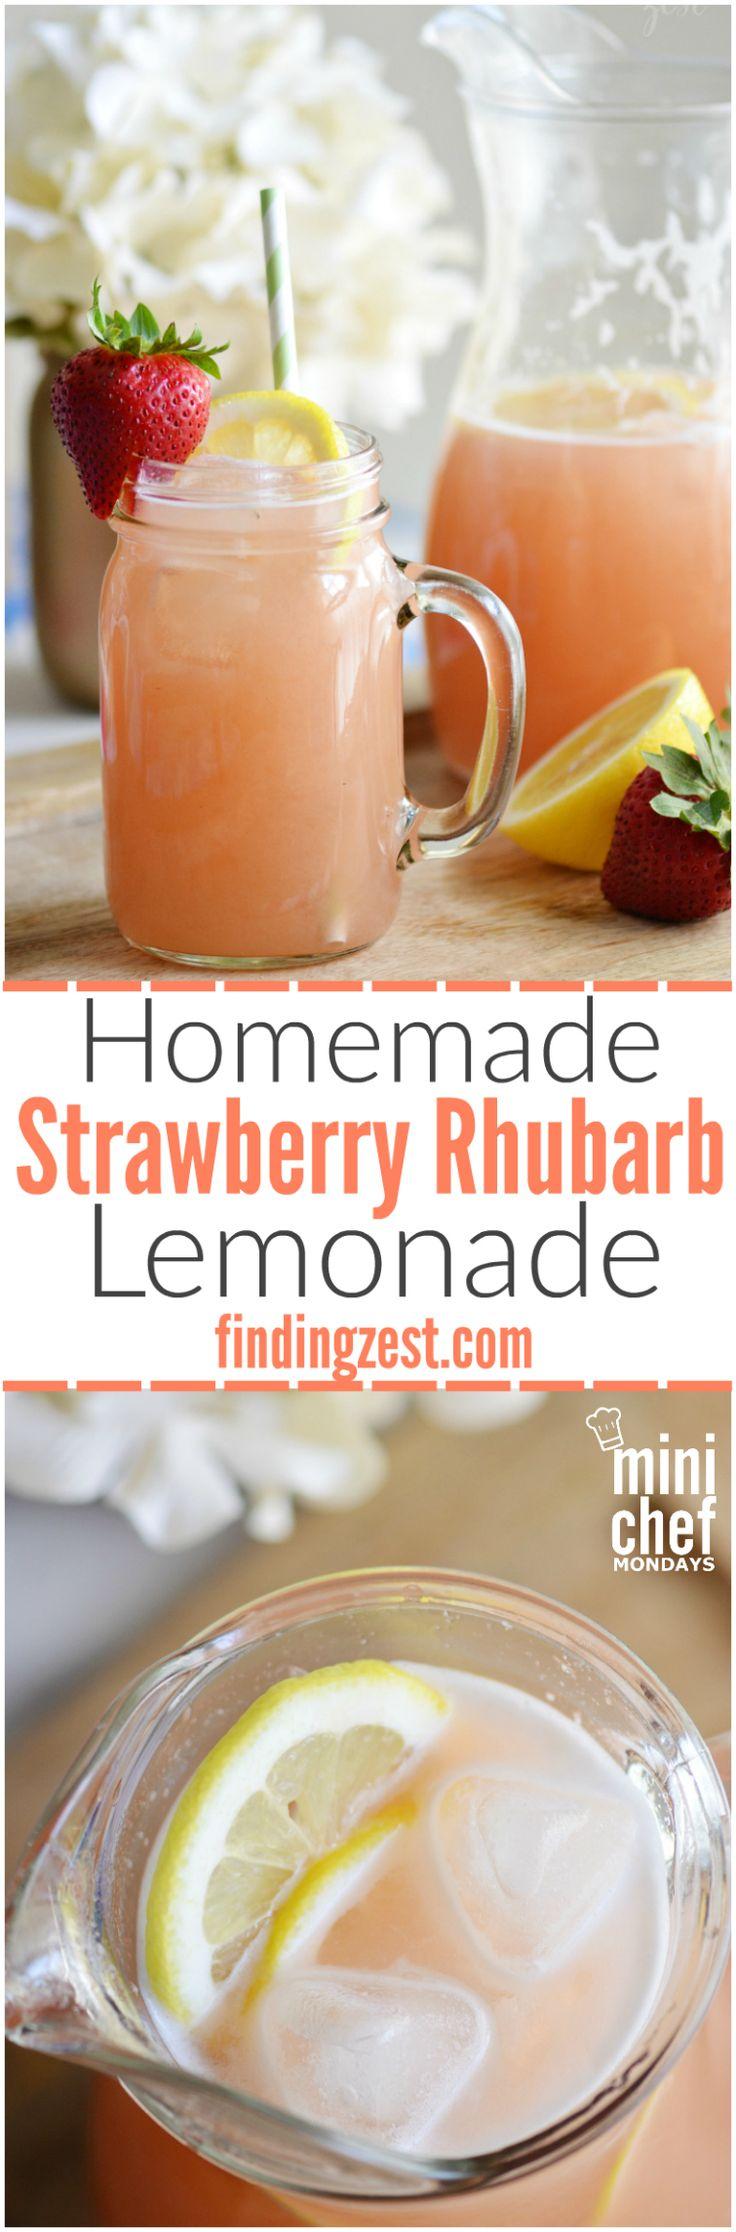 Homemade Strawberry Rhubarb Lemonade: Make this refreshing strawberry rhubarb lemonade as a way to cool off this summer! This is a fun, unique twist on traditional lemonade.